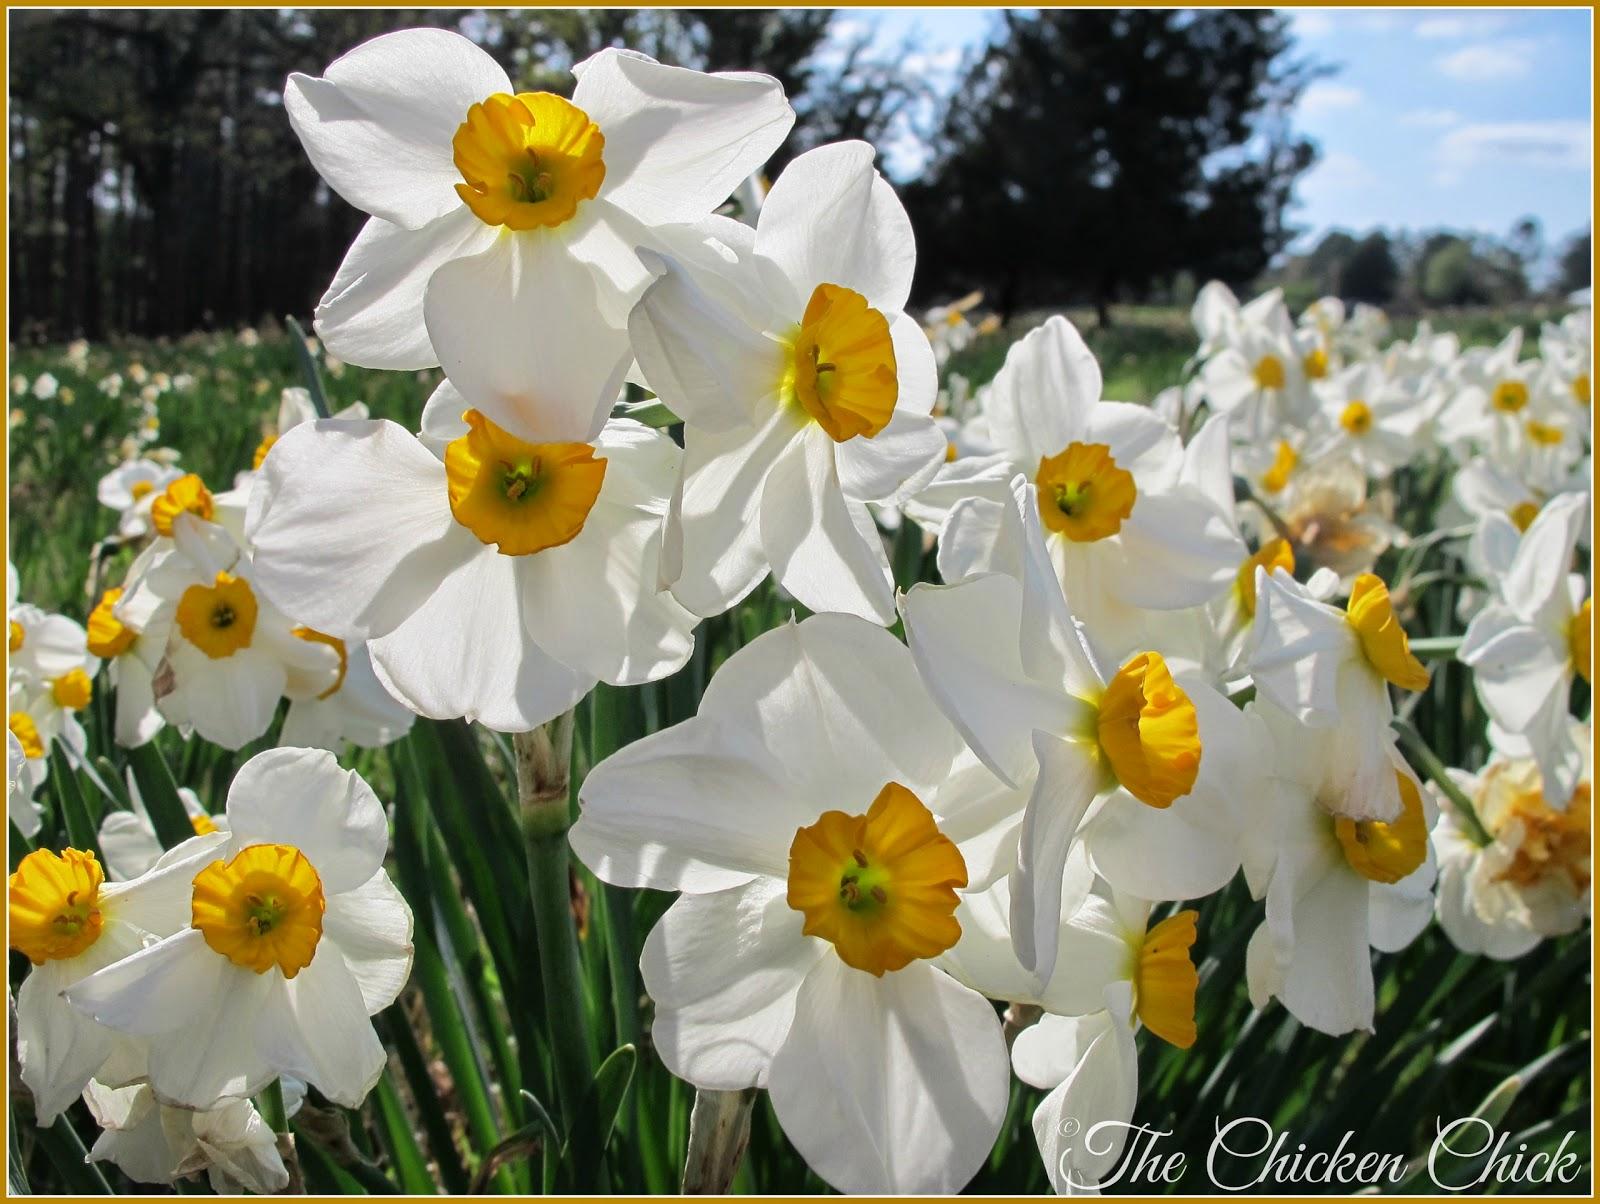 Daffodils growing on P Allen Smith's Arkansas farm